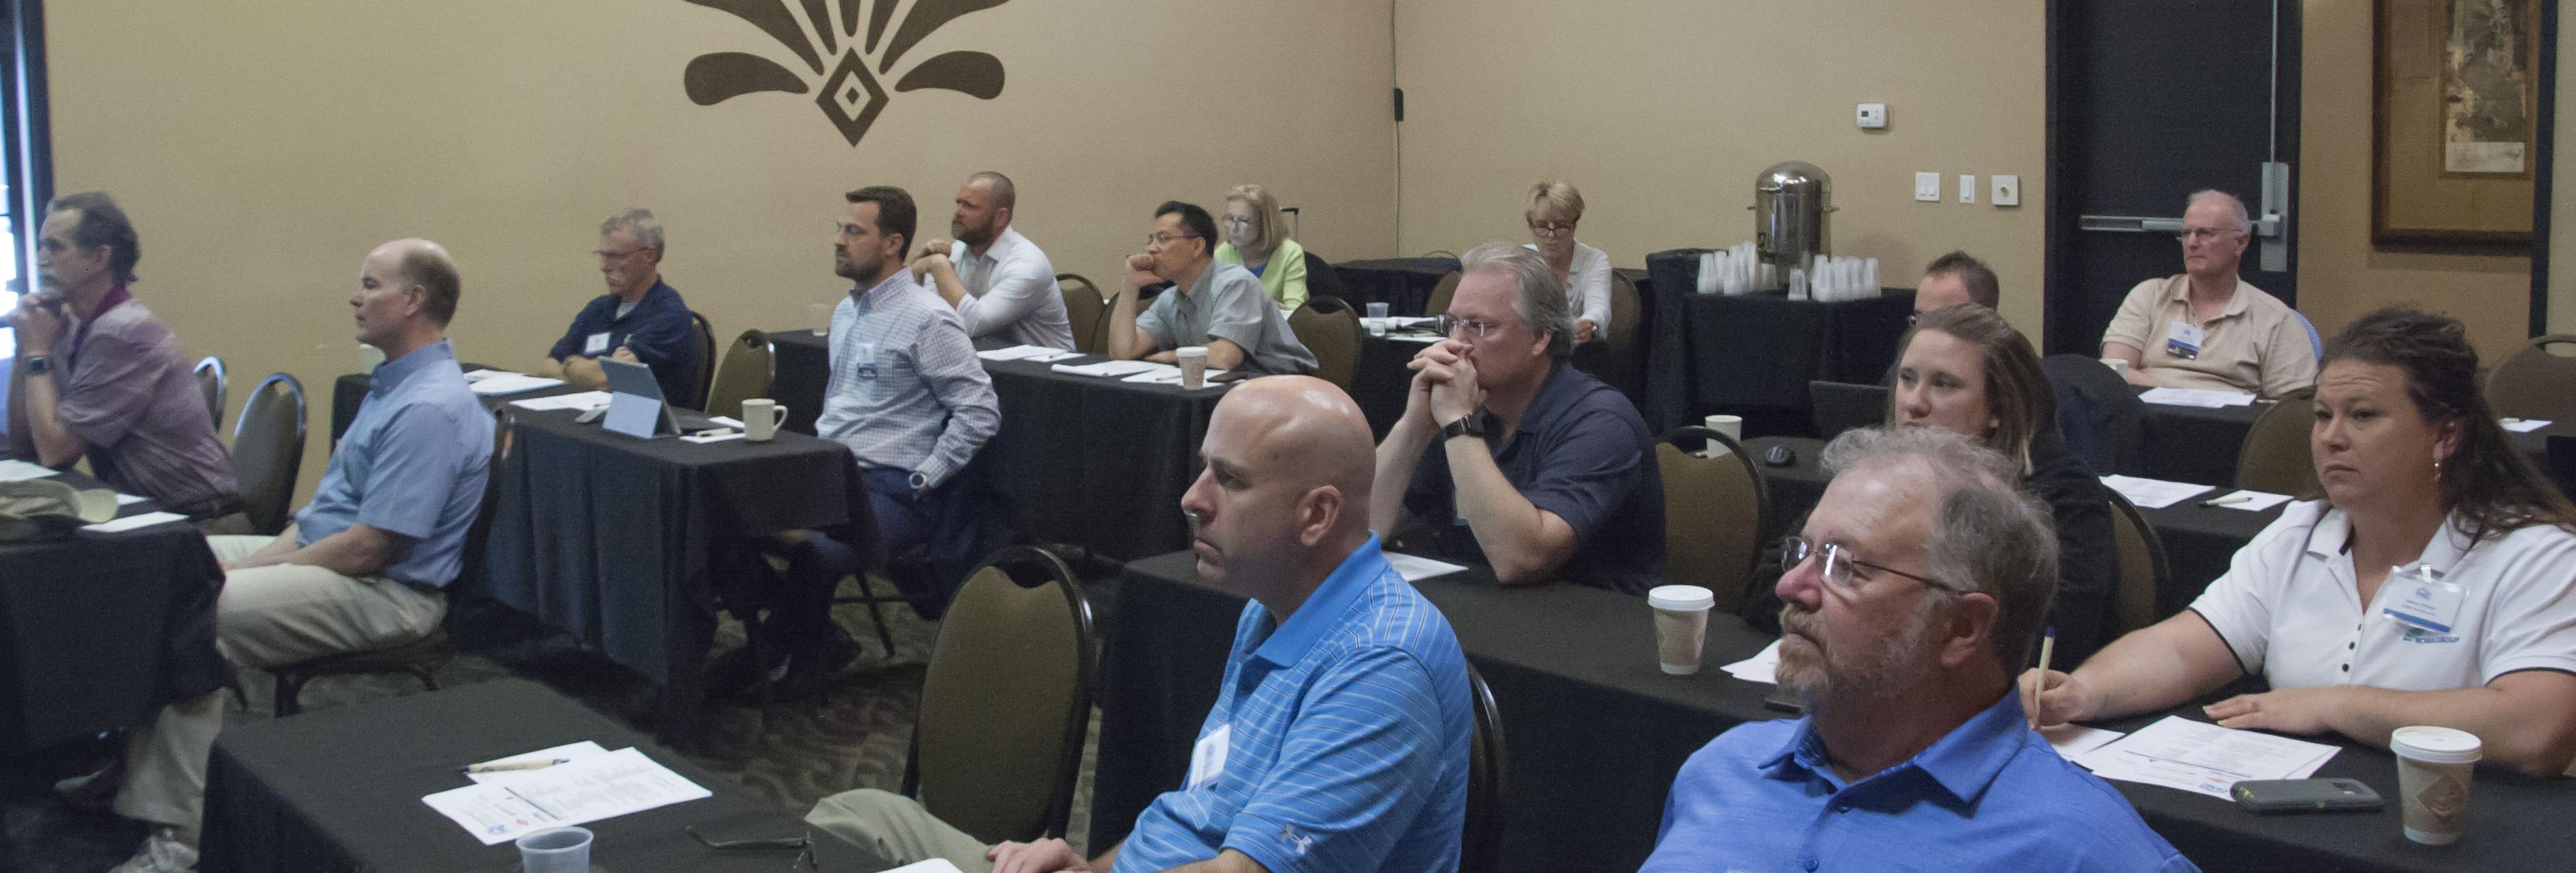 Attendees at 2017 Member Meeting